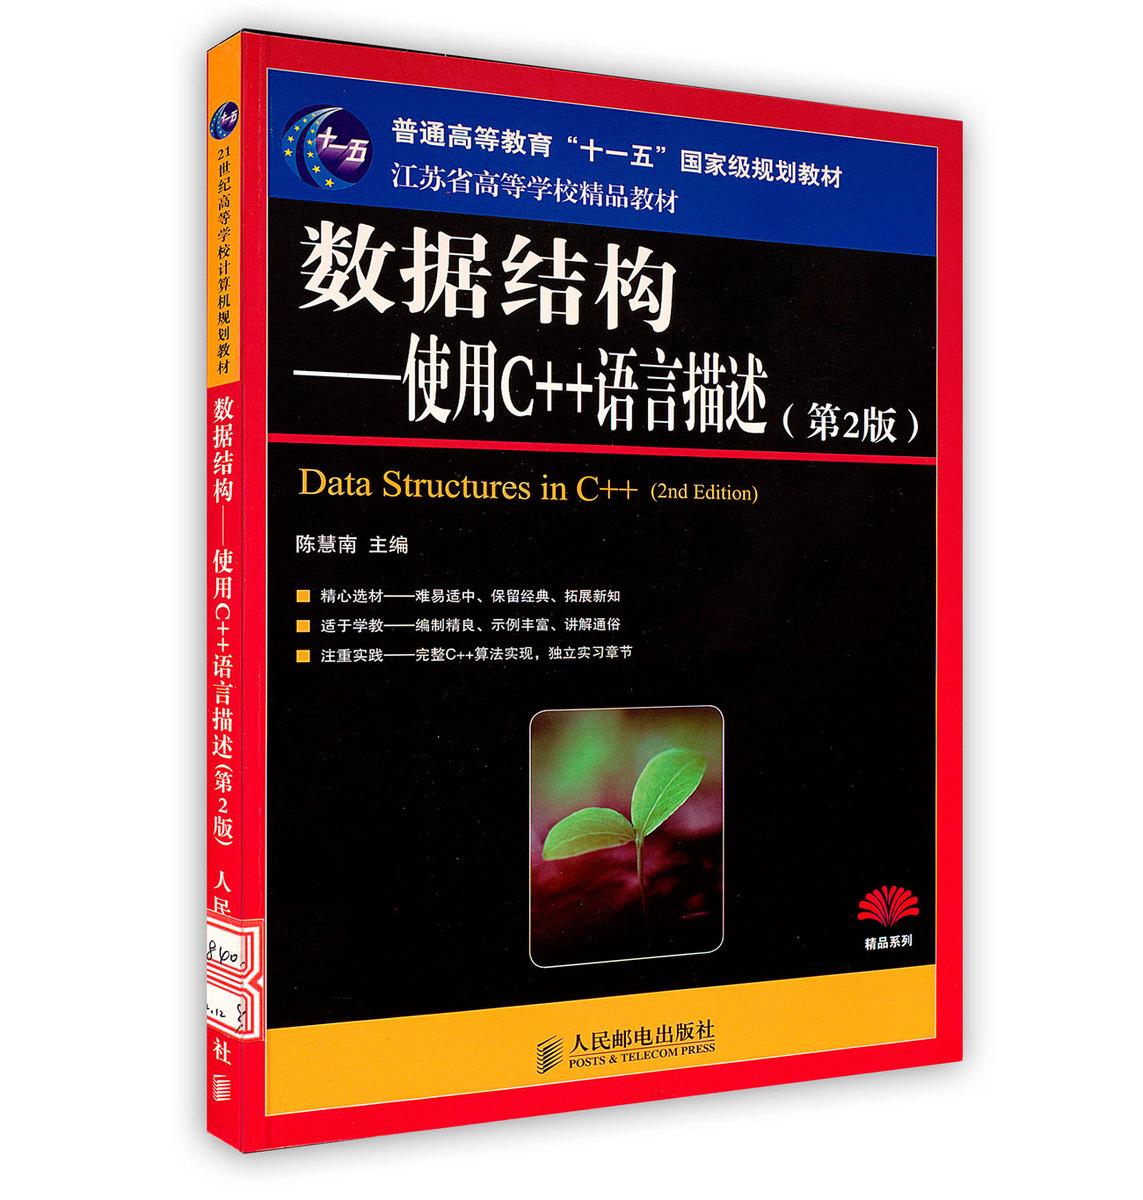 Компьютерная литература Артикул 43144900356